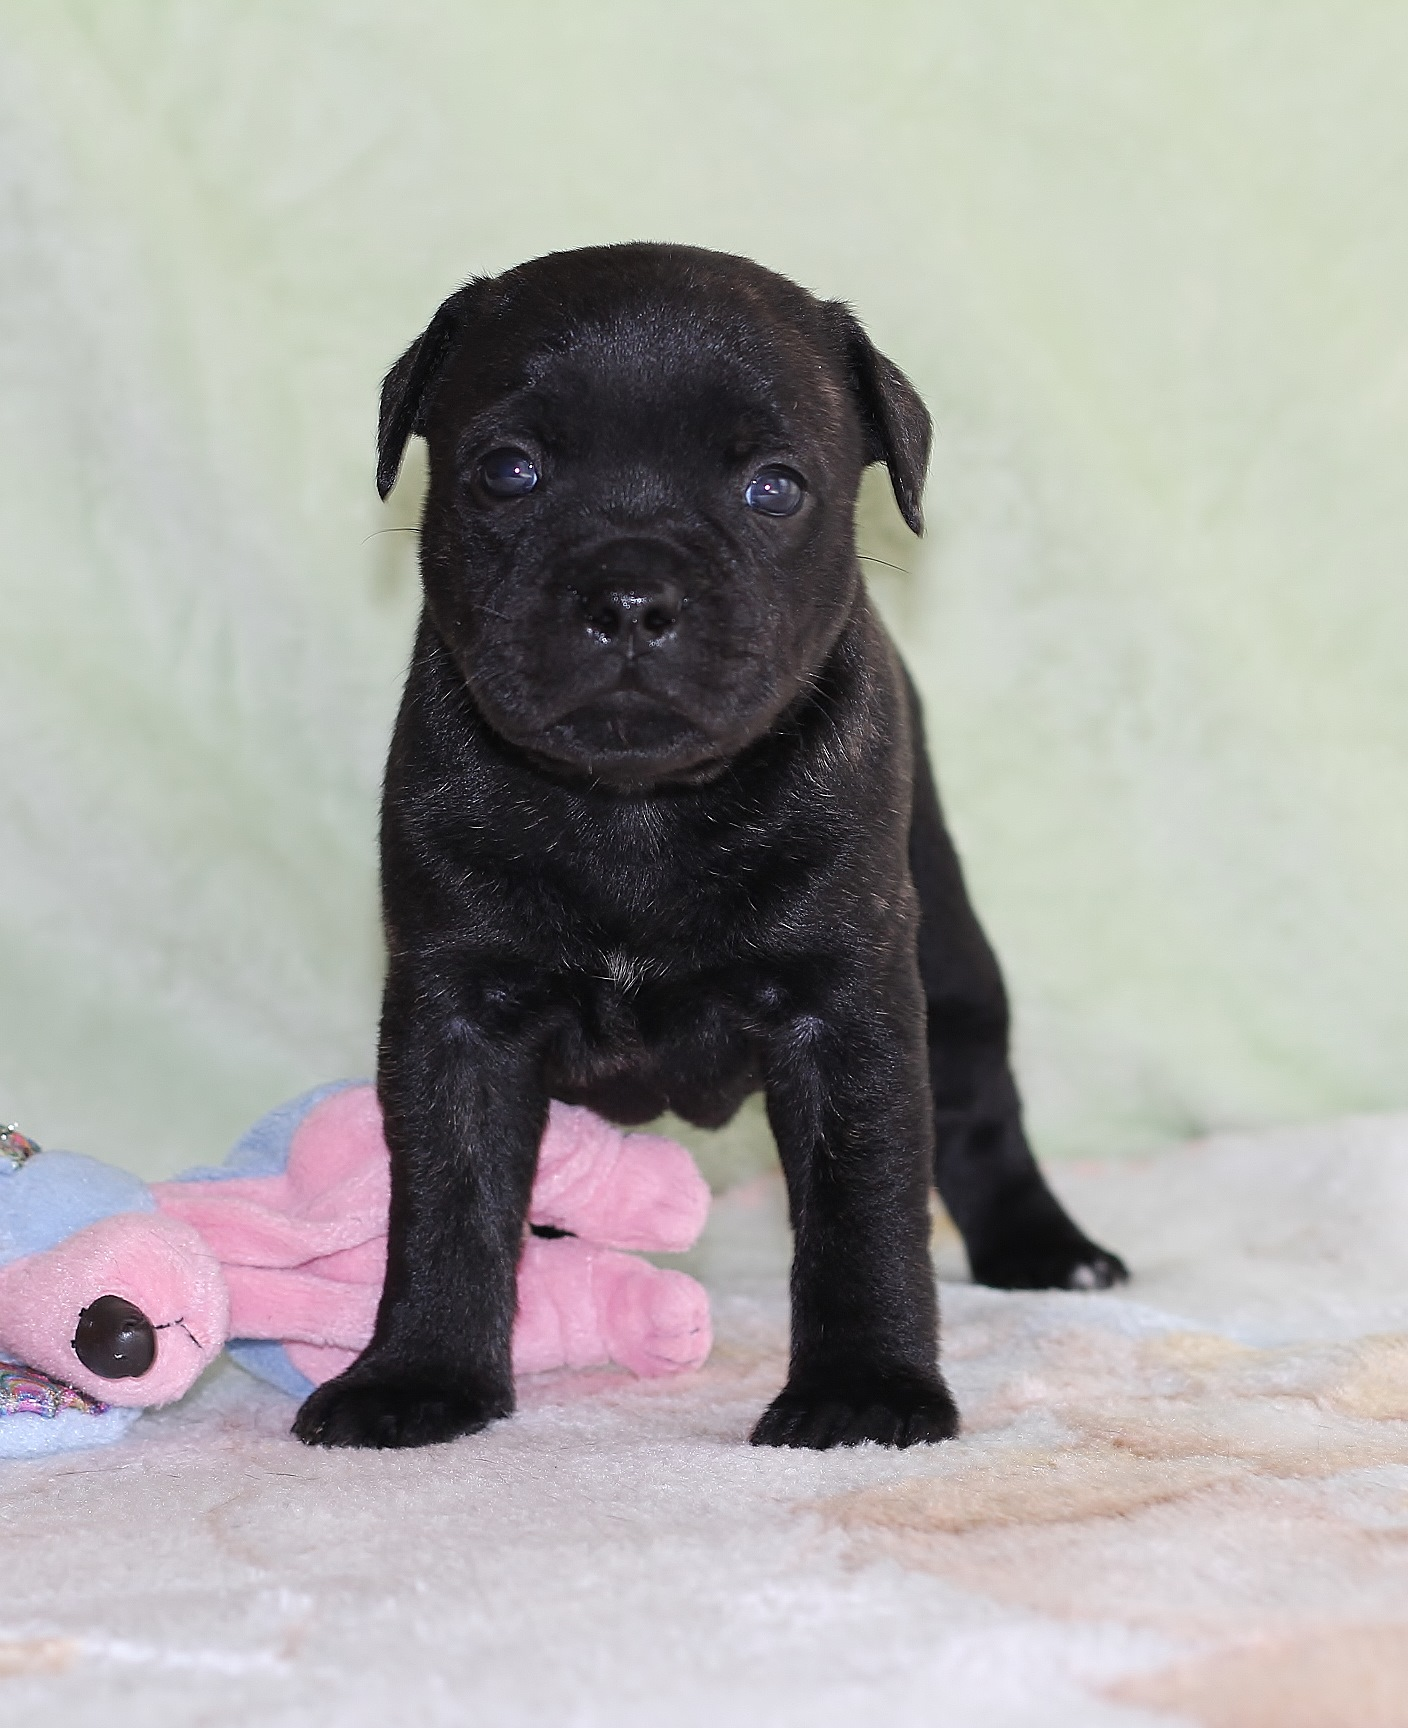 KNOTTSWAY CHICO Miracle Bulls, (purple boy) 29 days old